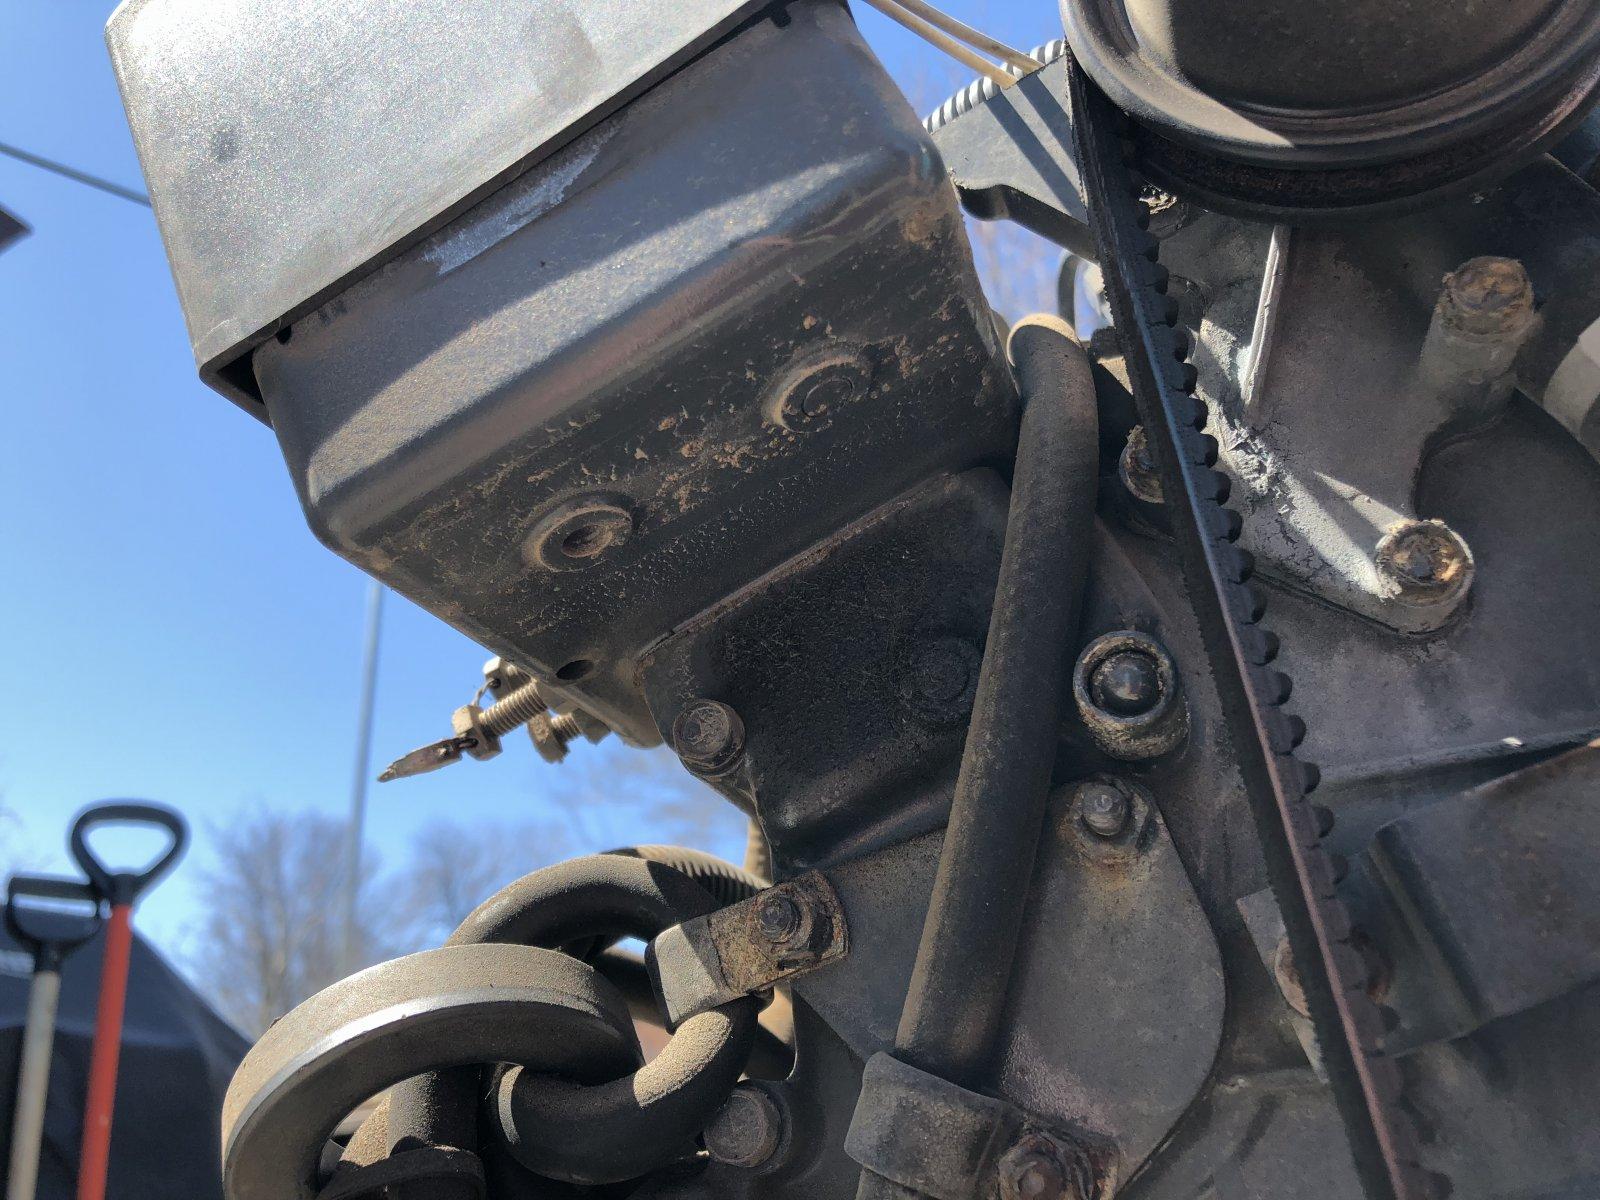 Cummins-Onan 7500 quiet diesel generator fault code 25